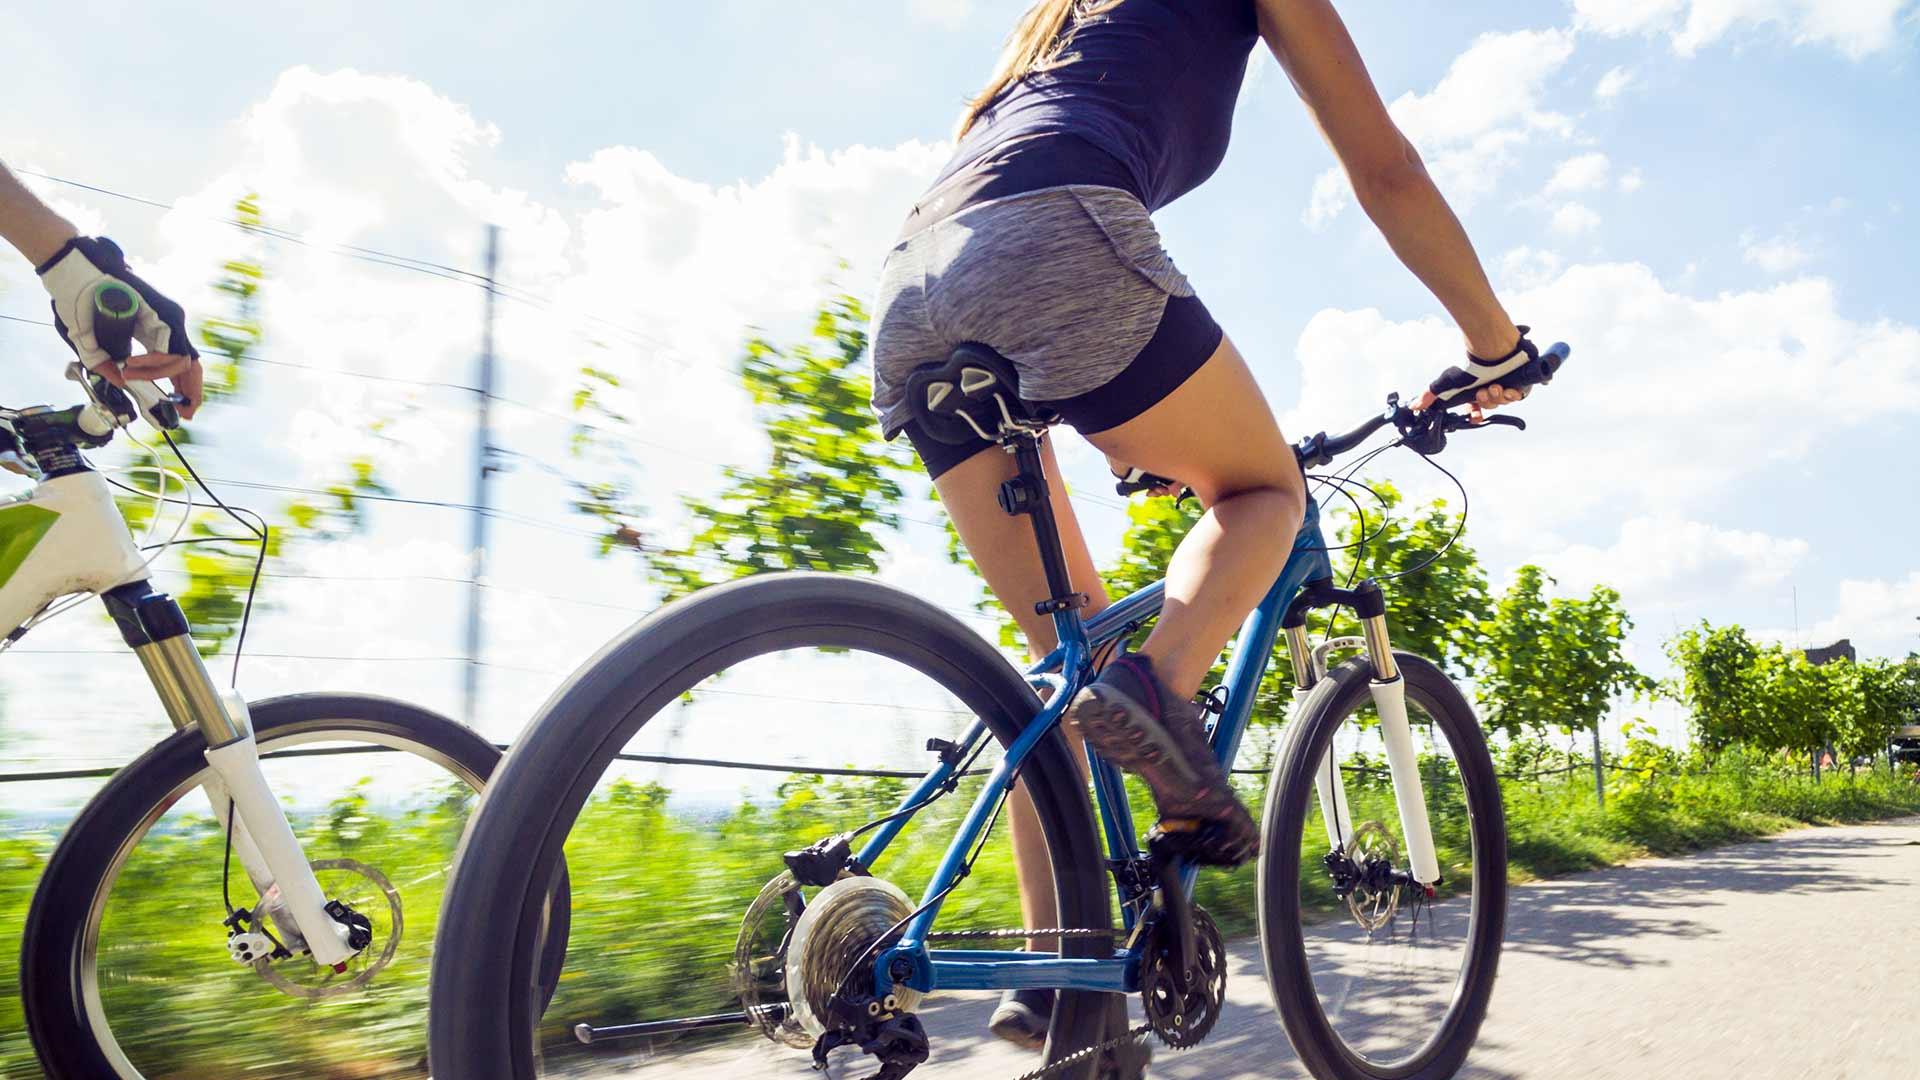 Tour in bici a Merano e dintorni